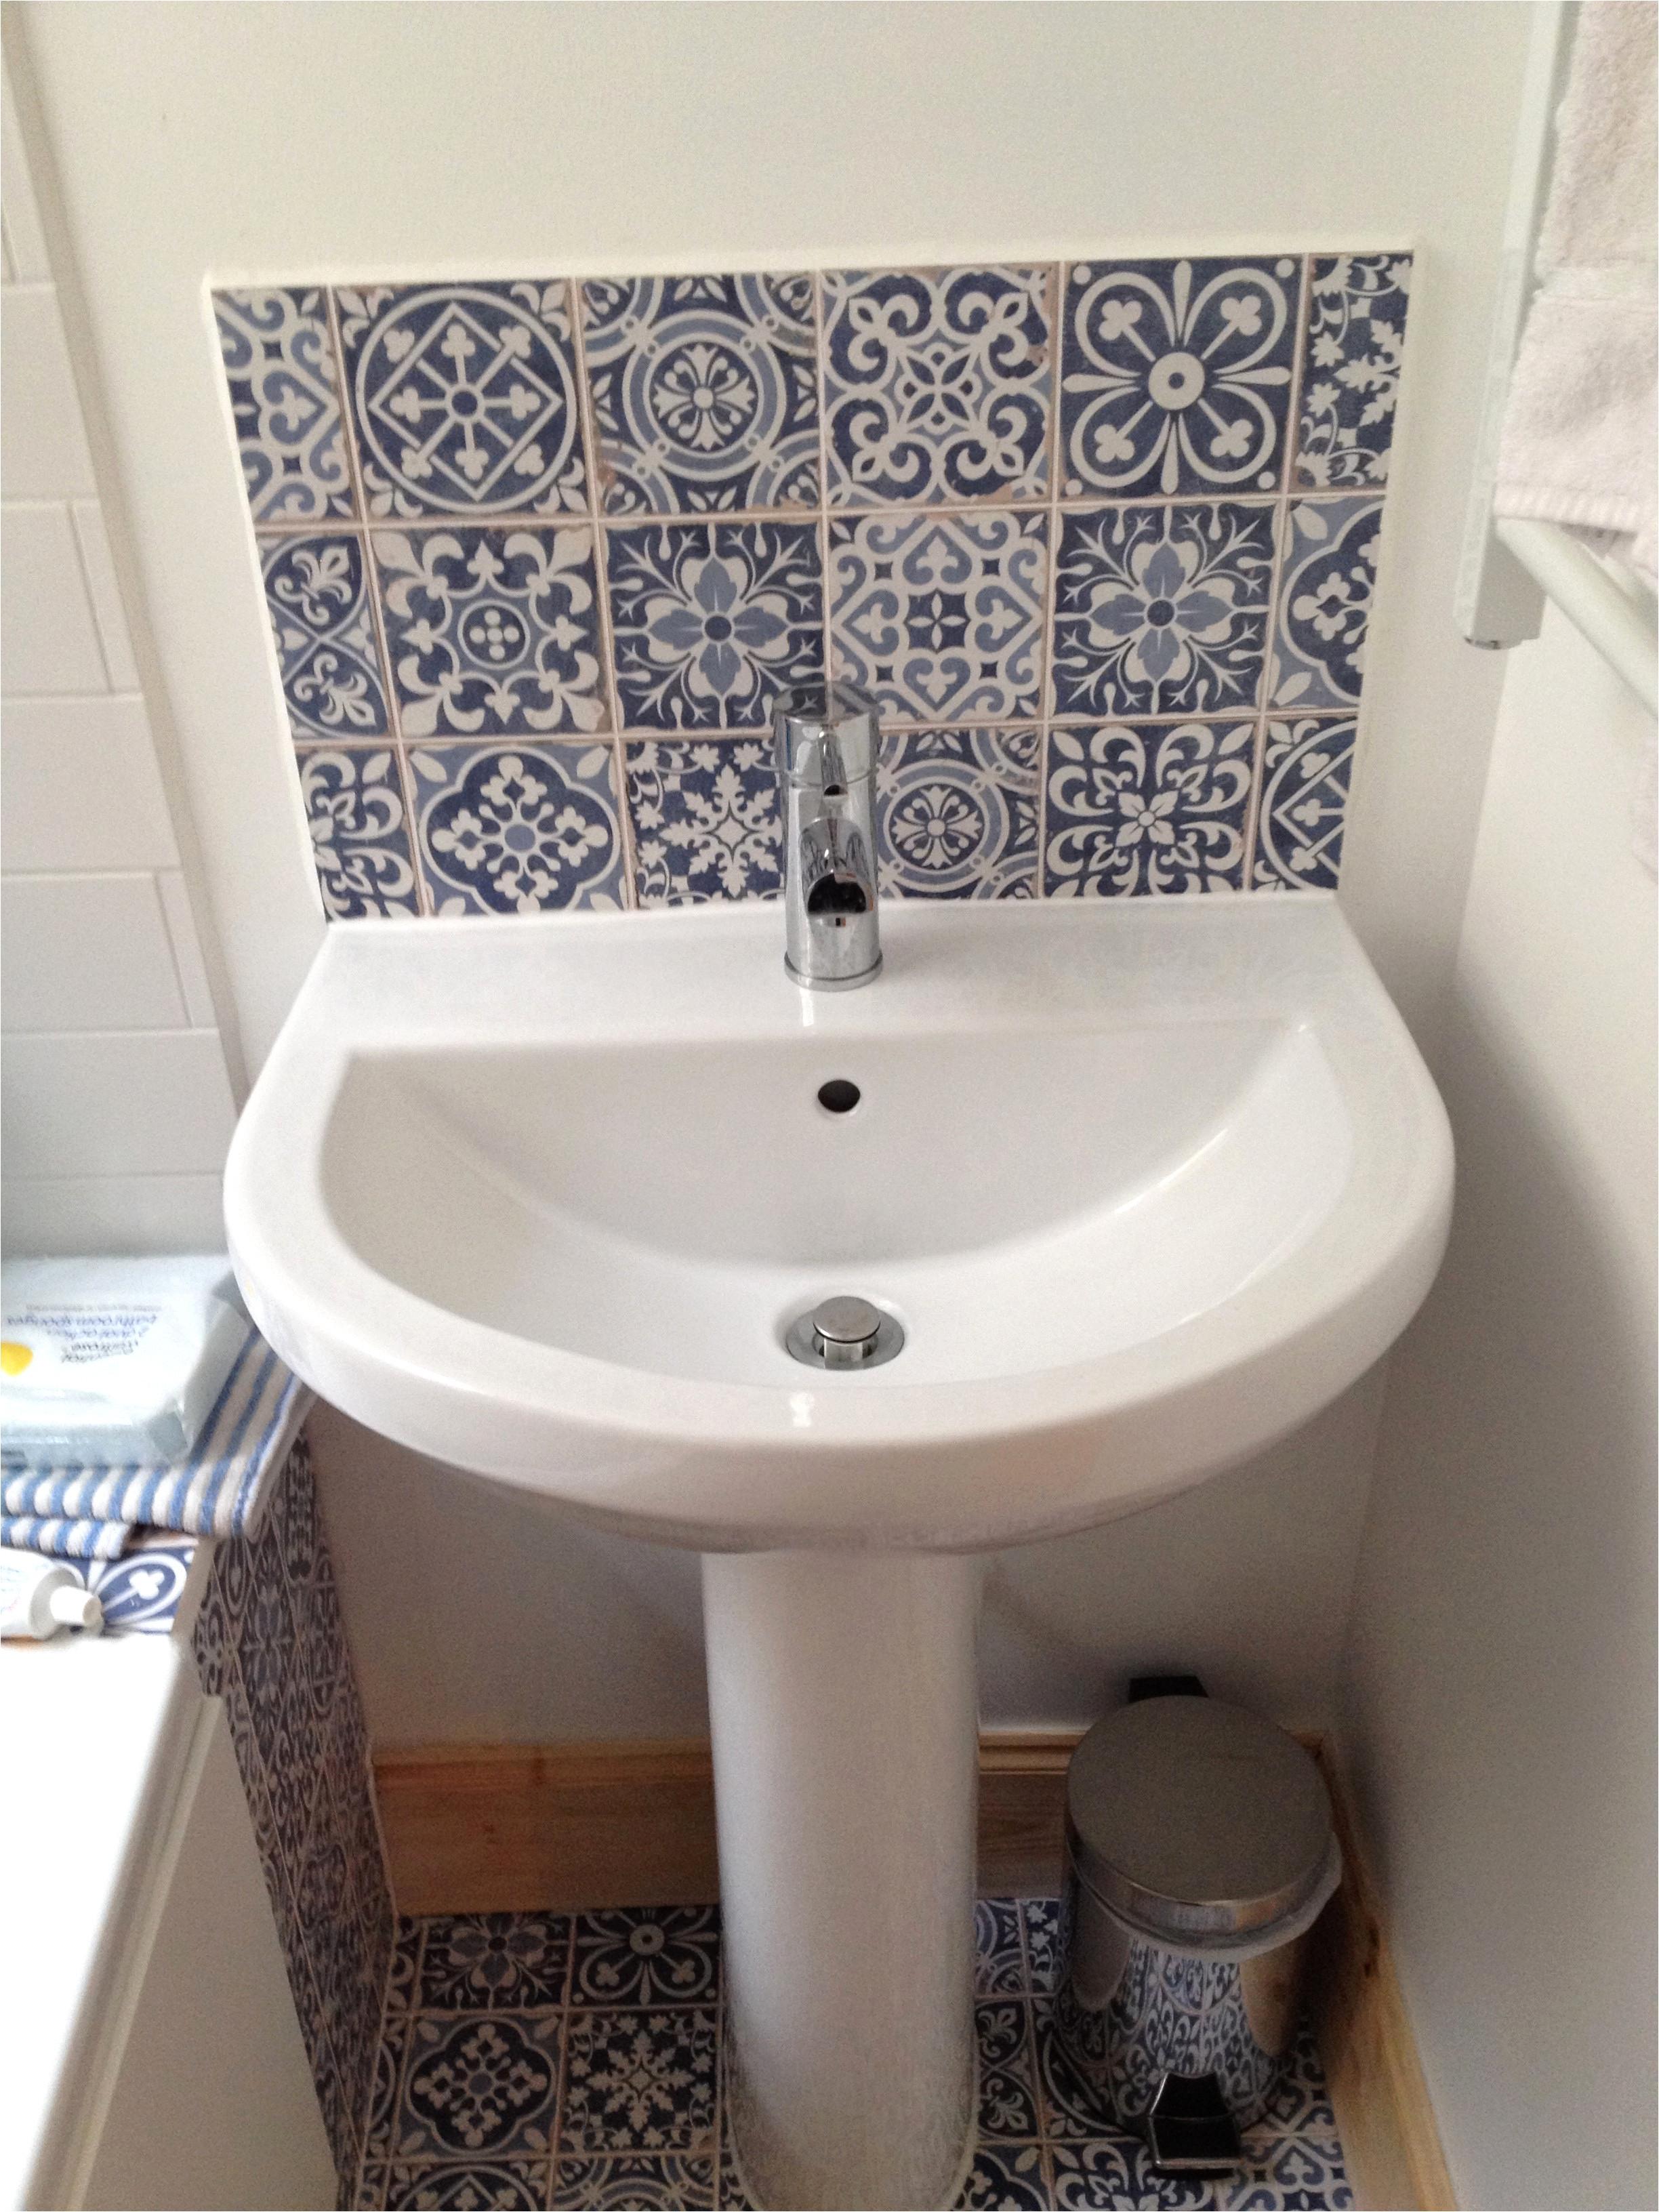 shower reglazing awesome 50 lovely reglazing bathroom tile 50 s shower reglazing unique bathtubs reglazing 0d from how to reglaze